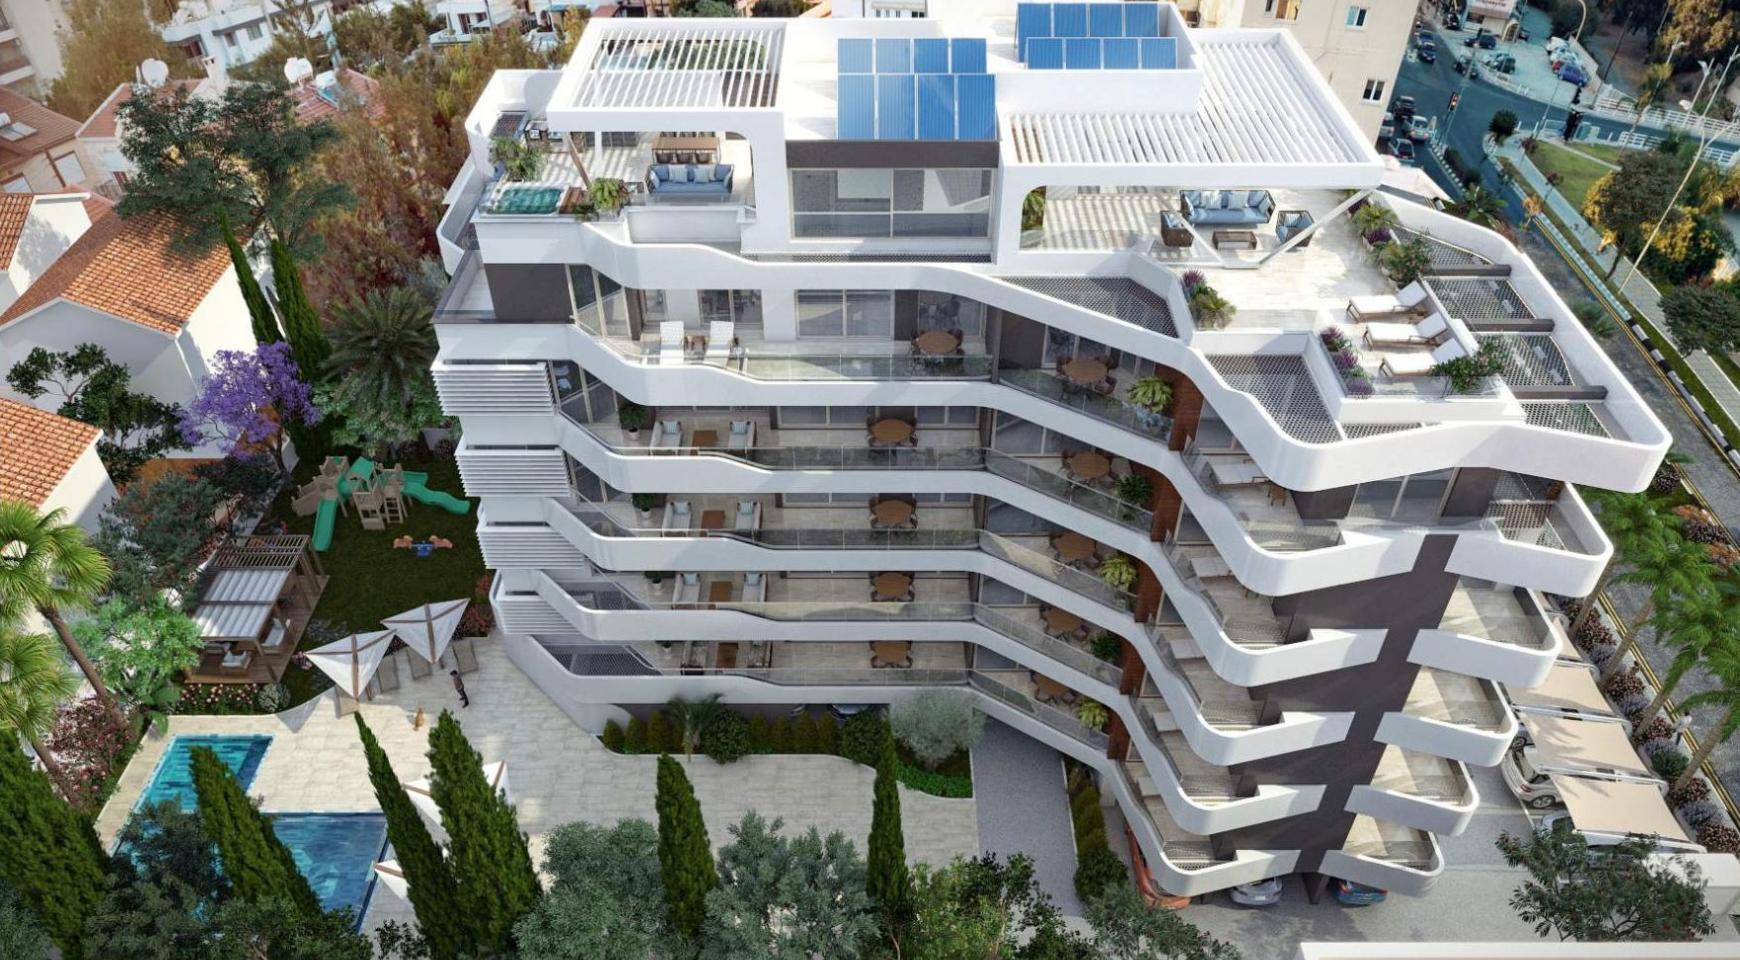 New 2 Bedroom Apartment in a Contemporary Complex near the Sea - 4